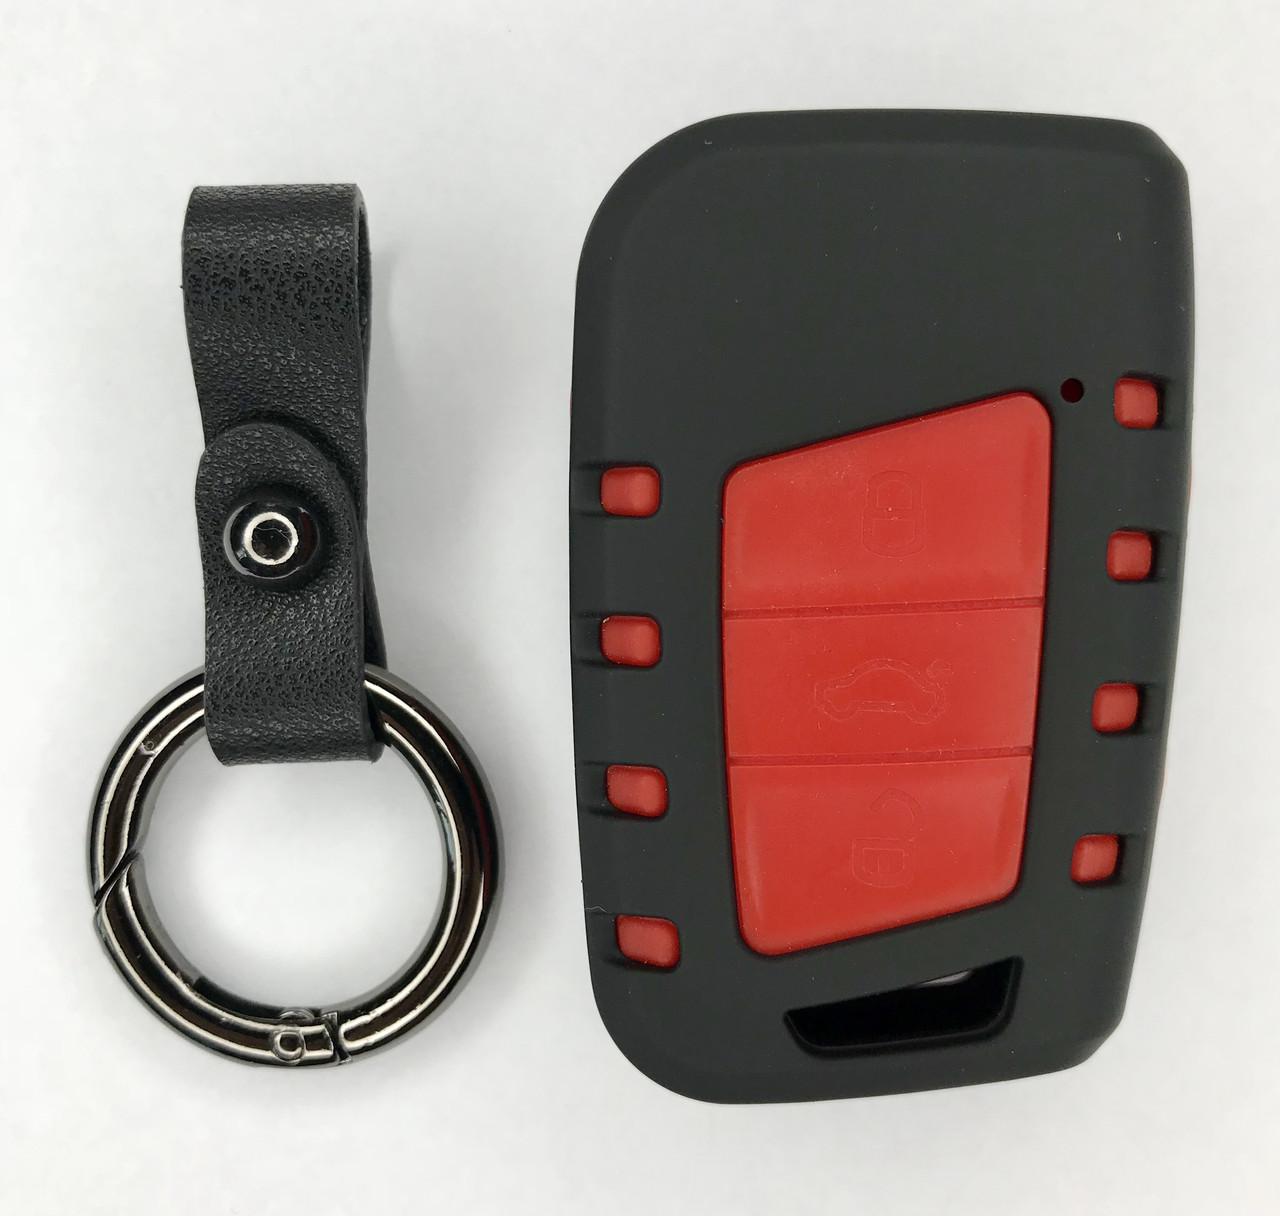 Матовый чехол для ключа Seat Altea,Altea FreeTrack,Altea XL,Ateca,Córdoba,Ibiza FR,Leon,Leon Cupra,Leon,Toledo